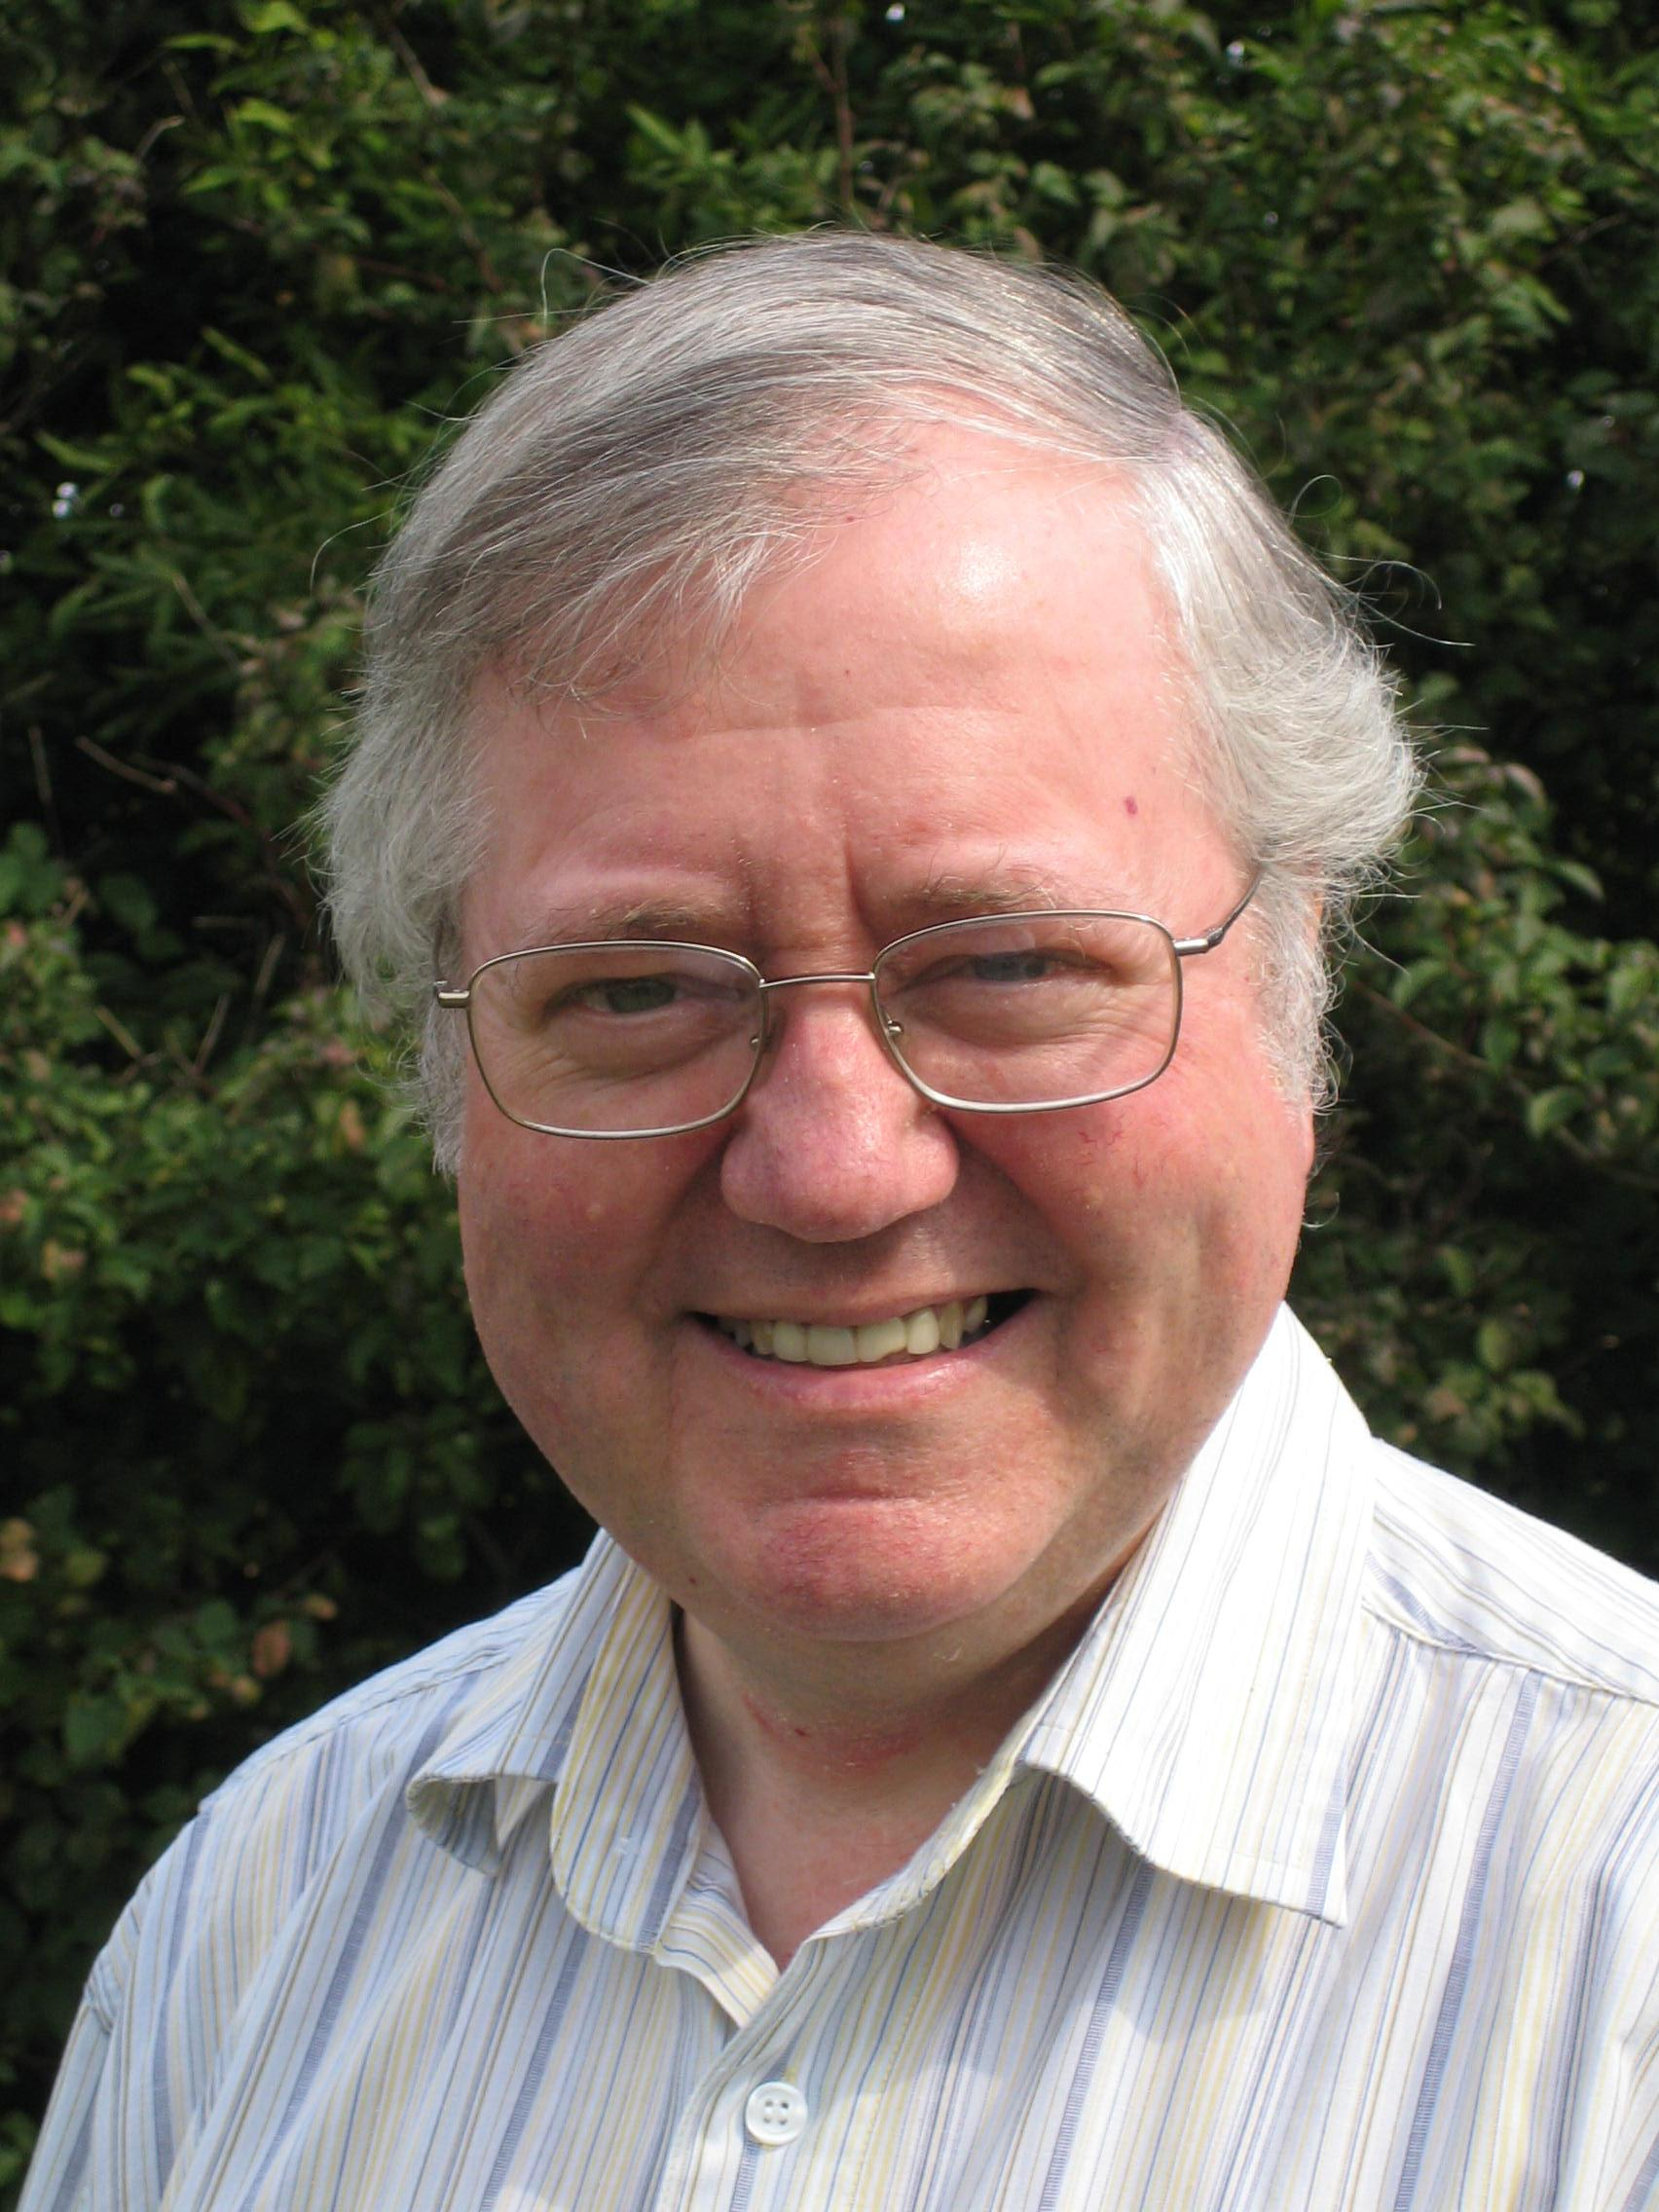 Watch David Schofield (born 1951) video